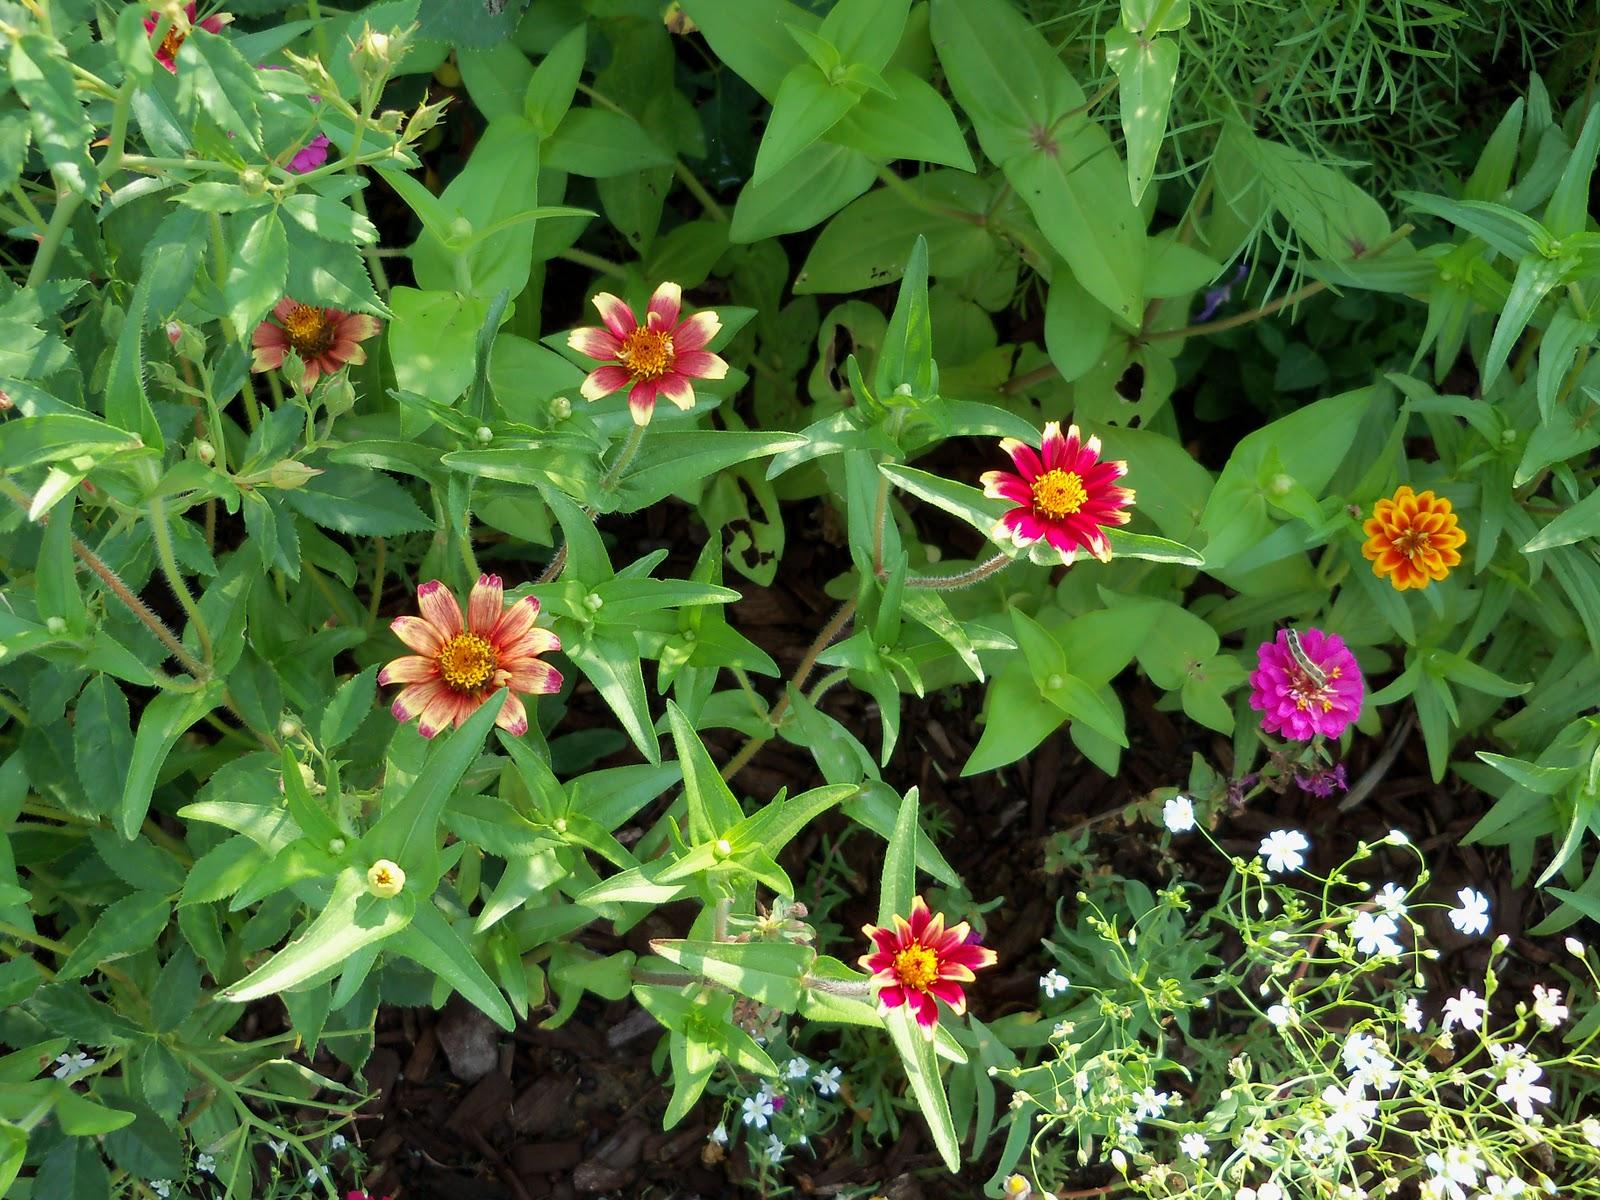 Gardening 2010, Part Two - 101_3294.JPG